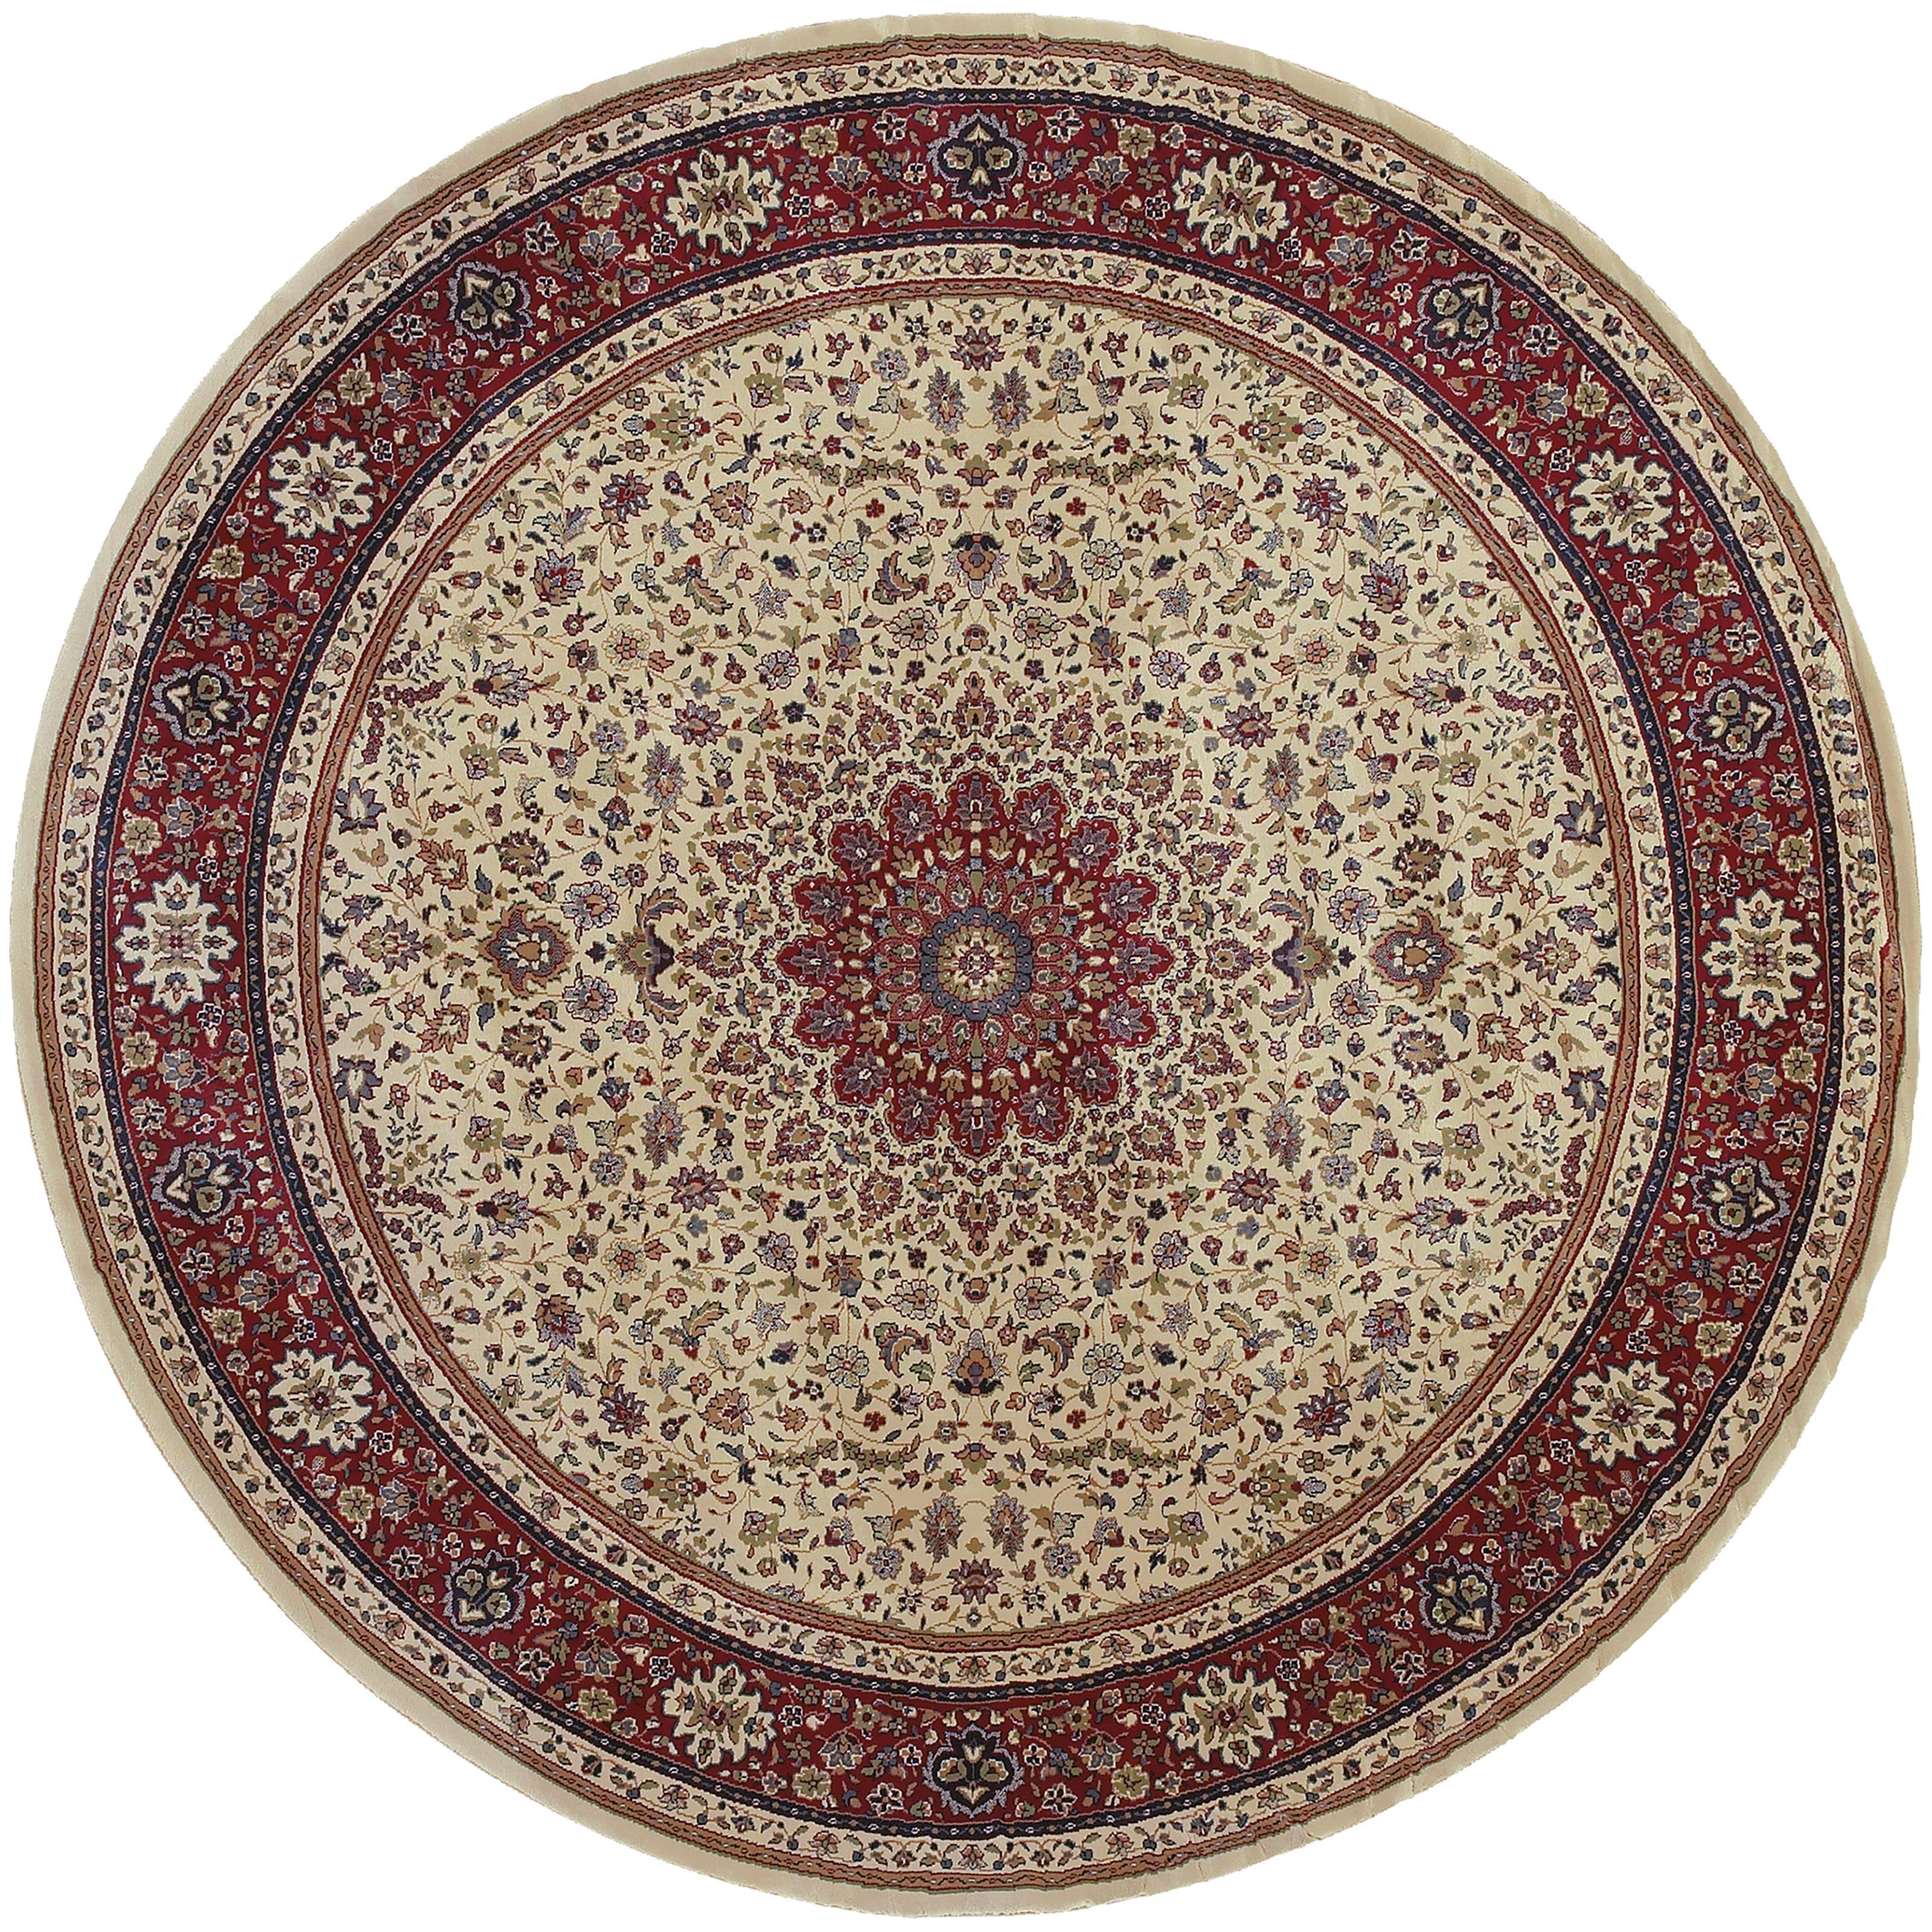 Oriental Weavers Ariana 8' Rug - Item Number: A095J3240240ST